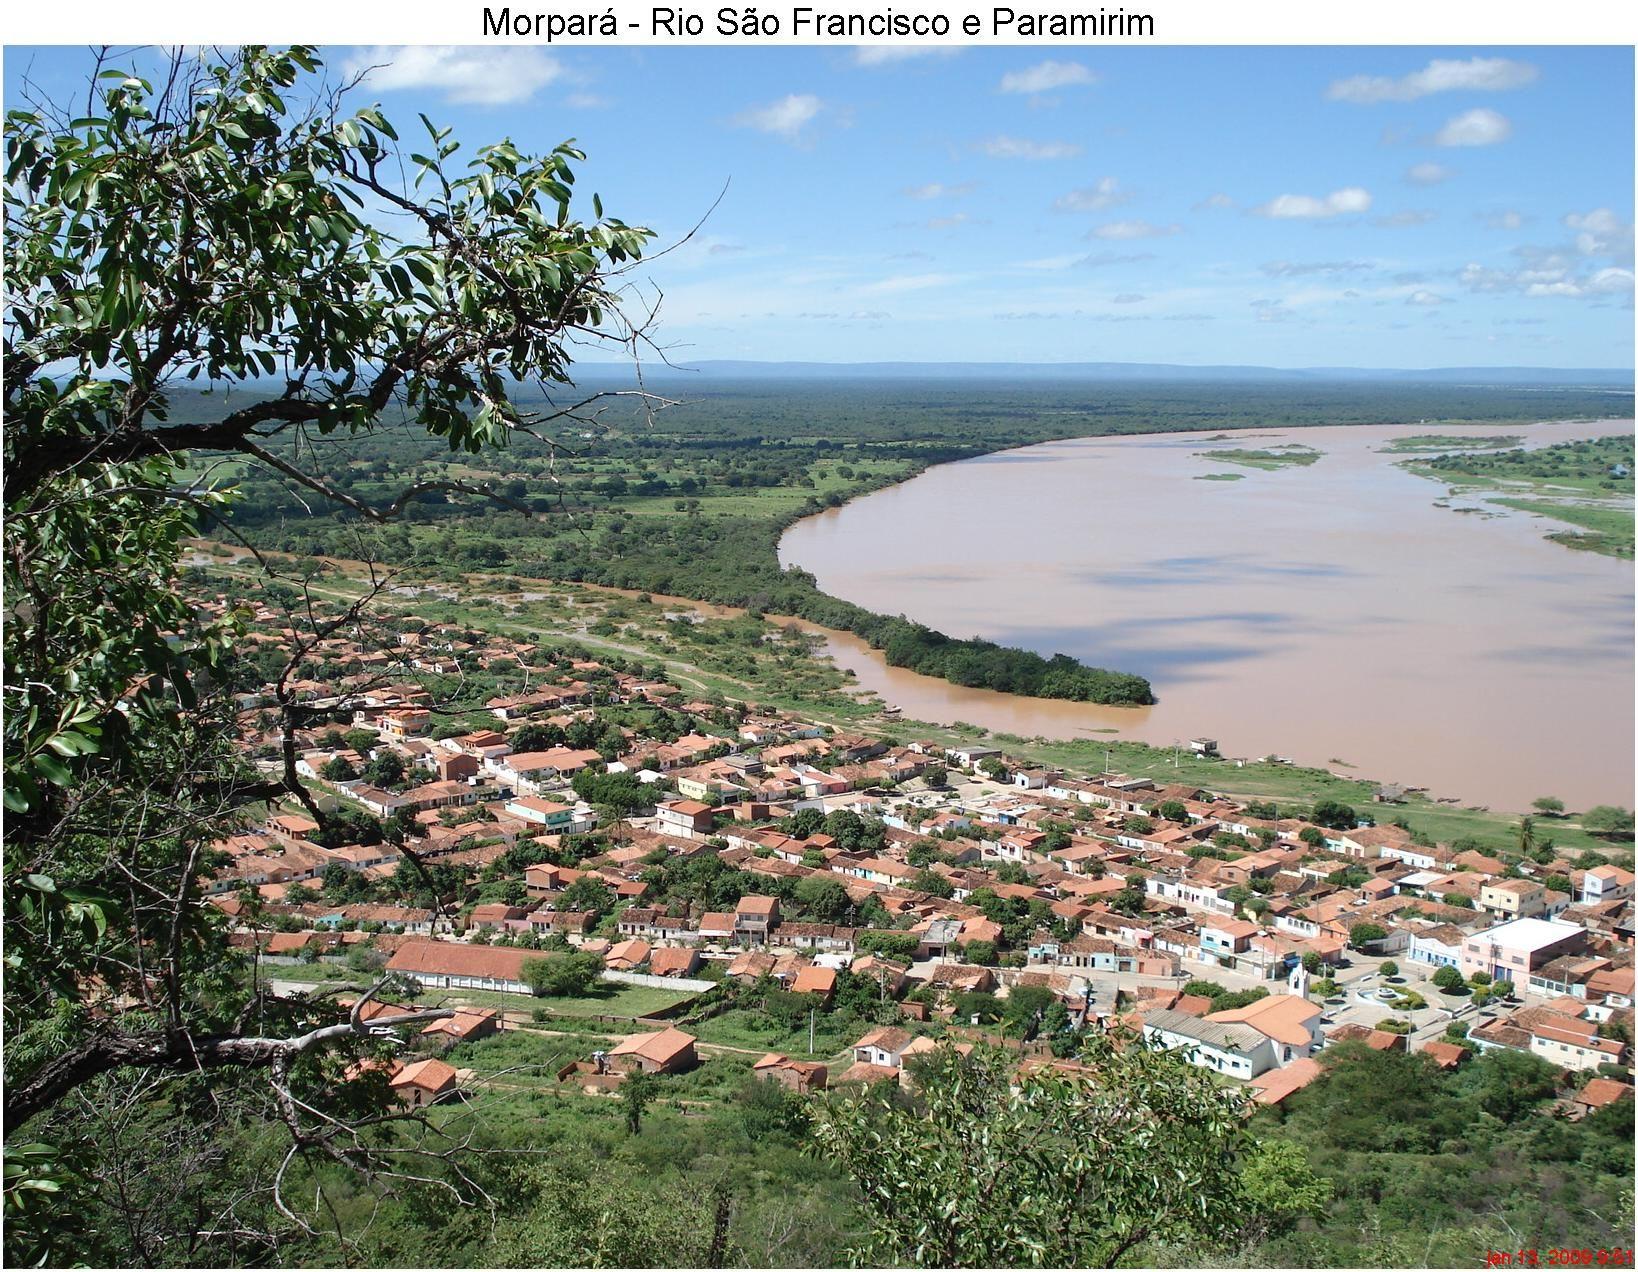 Morpará Bahia fonte: i.pinimg.com